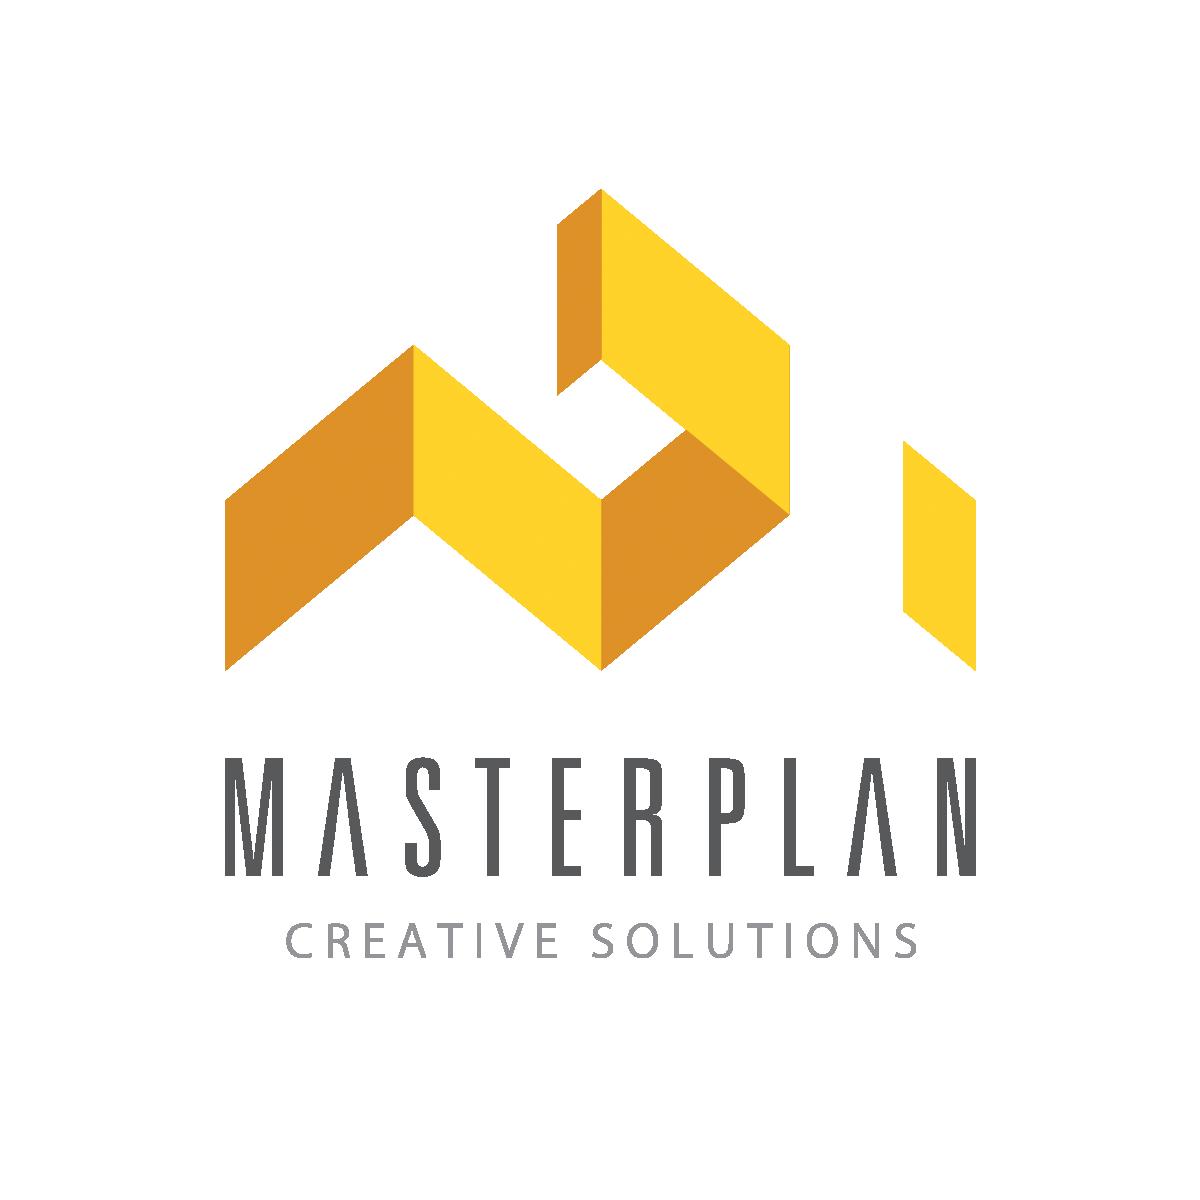 Masterplan Partner of Tokinomo Advertising Robots